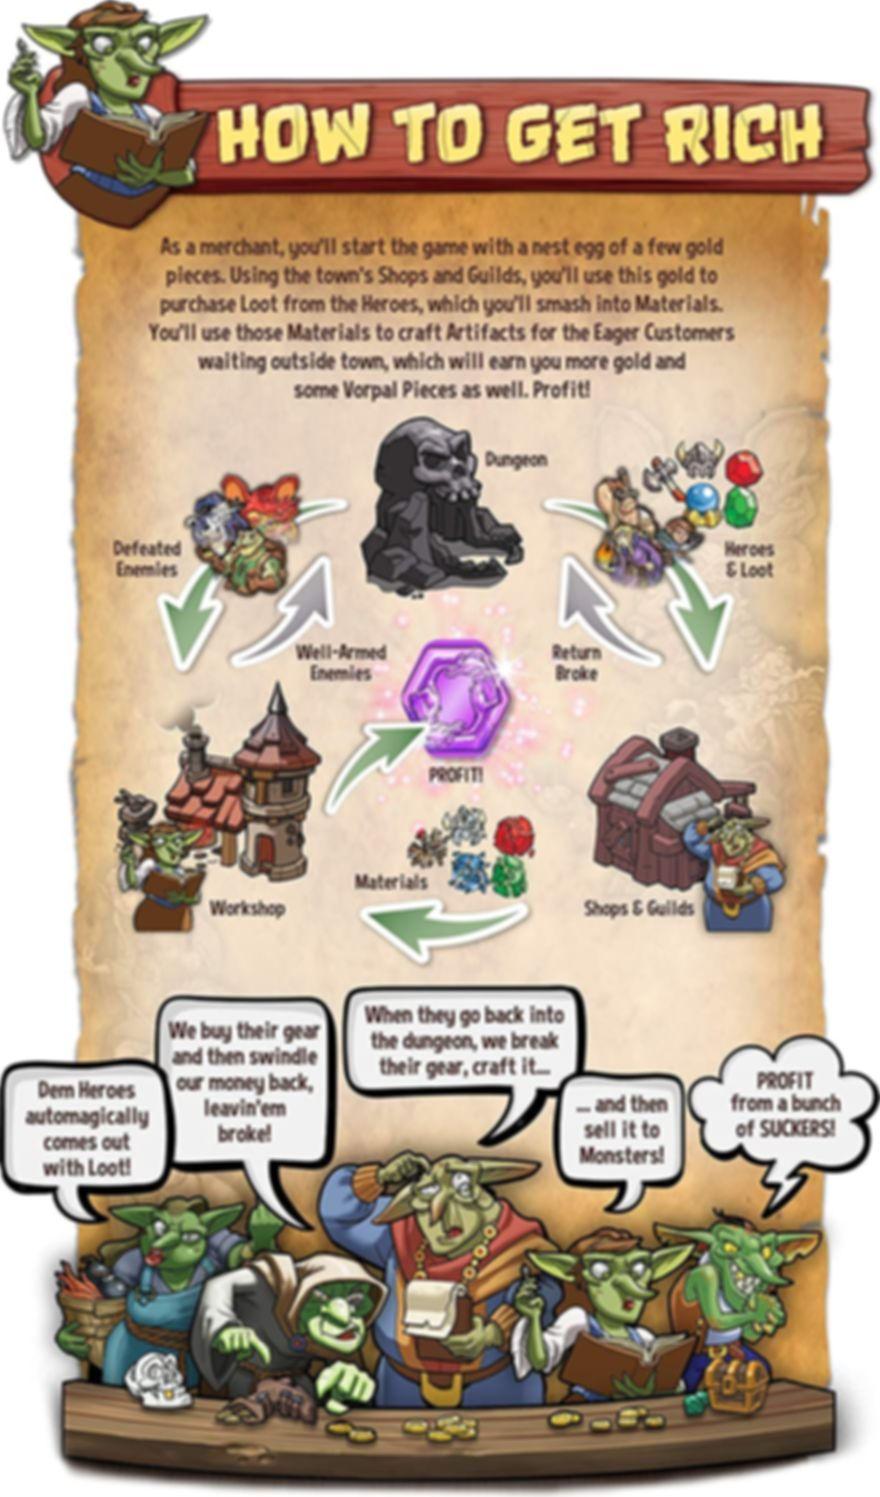 Heroes Welcome: Kickbacks Expansion manual